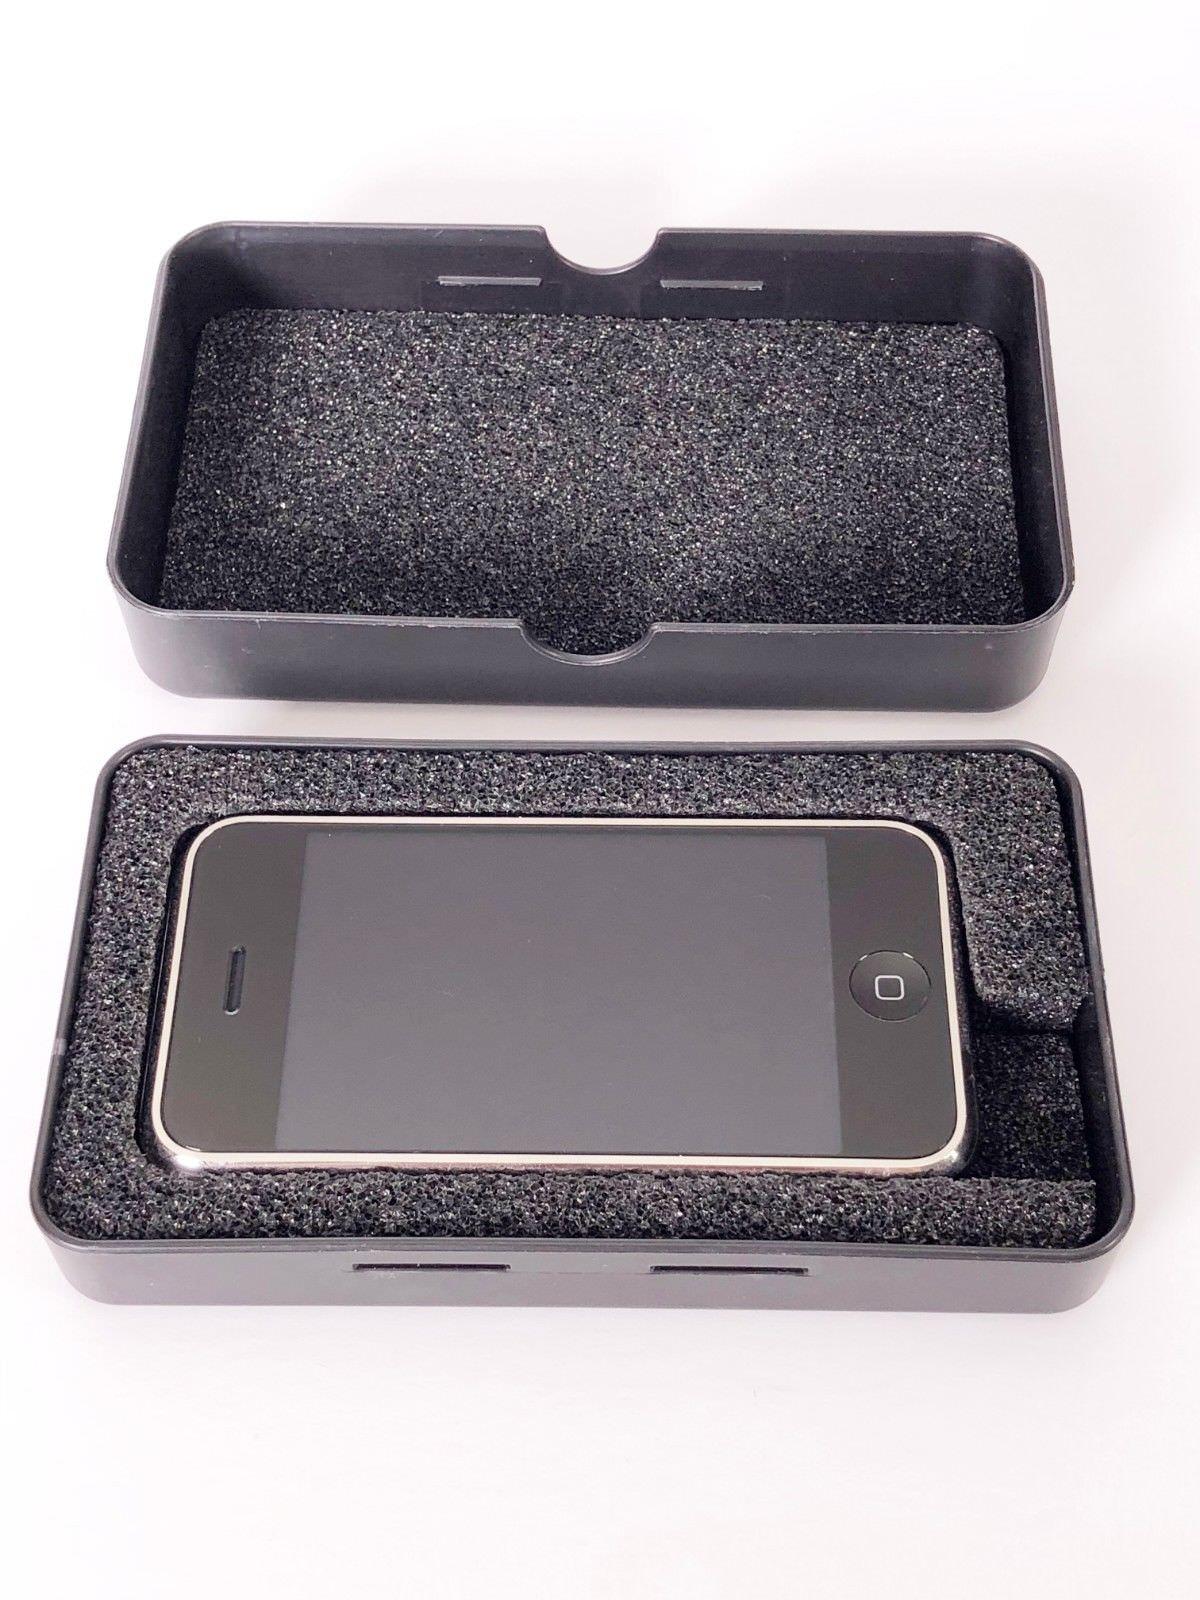 Prototype-Original-iPhone-on-ebay-4.jpg